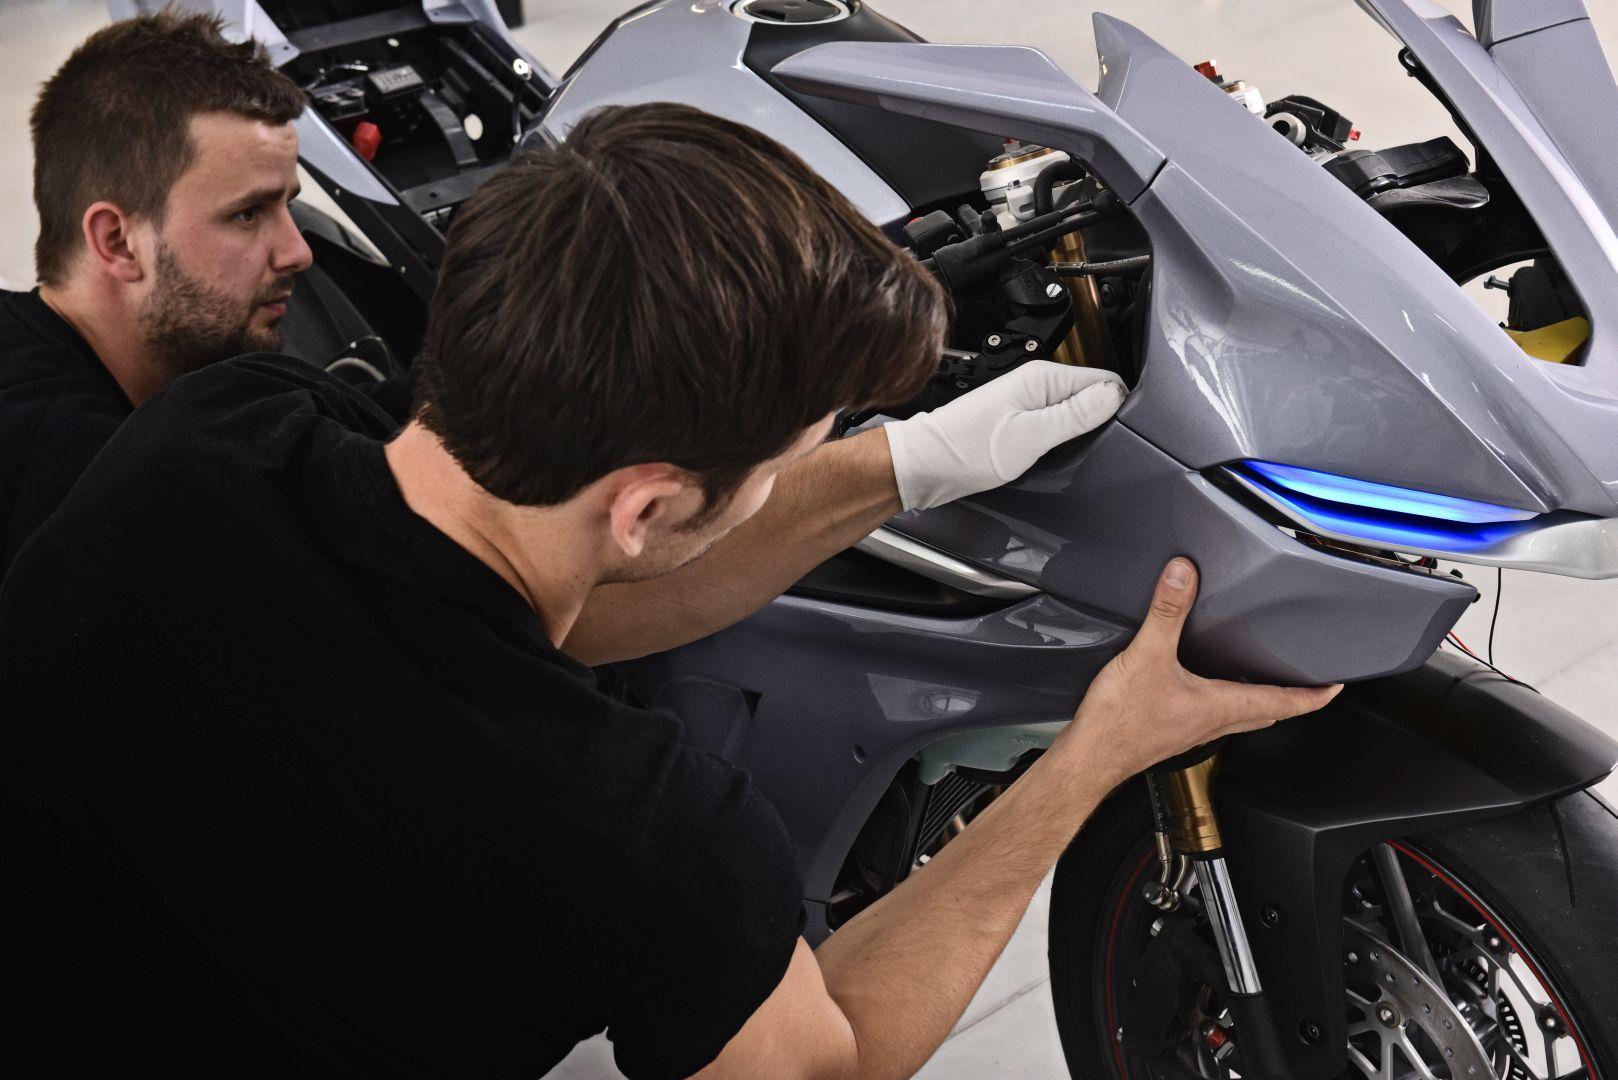 Personalizacja motocykla